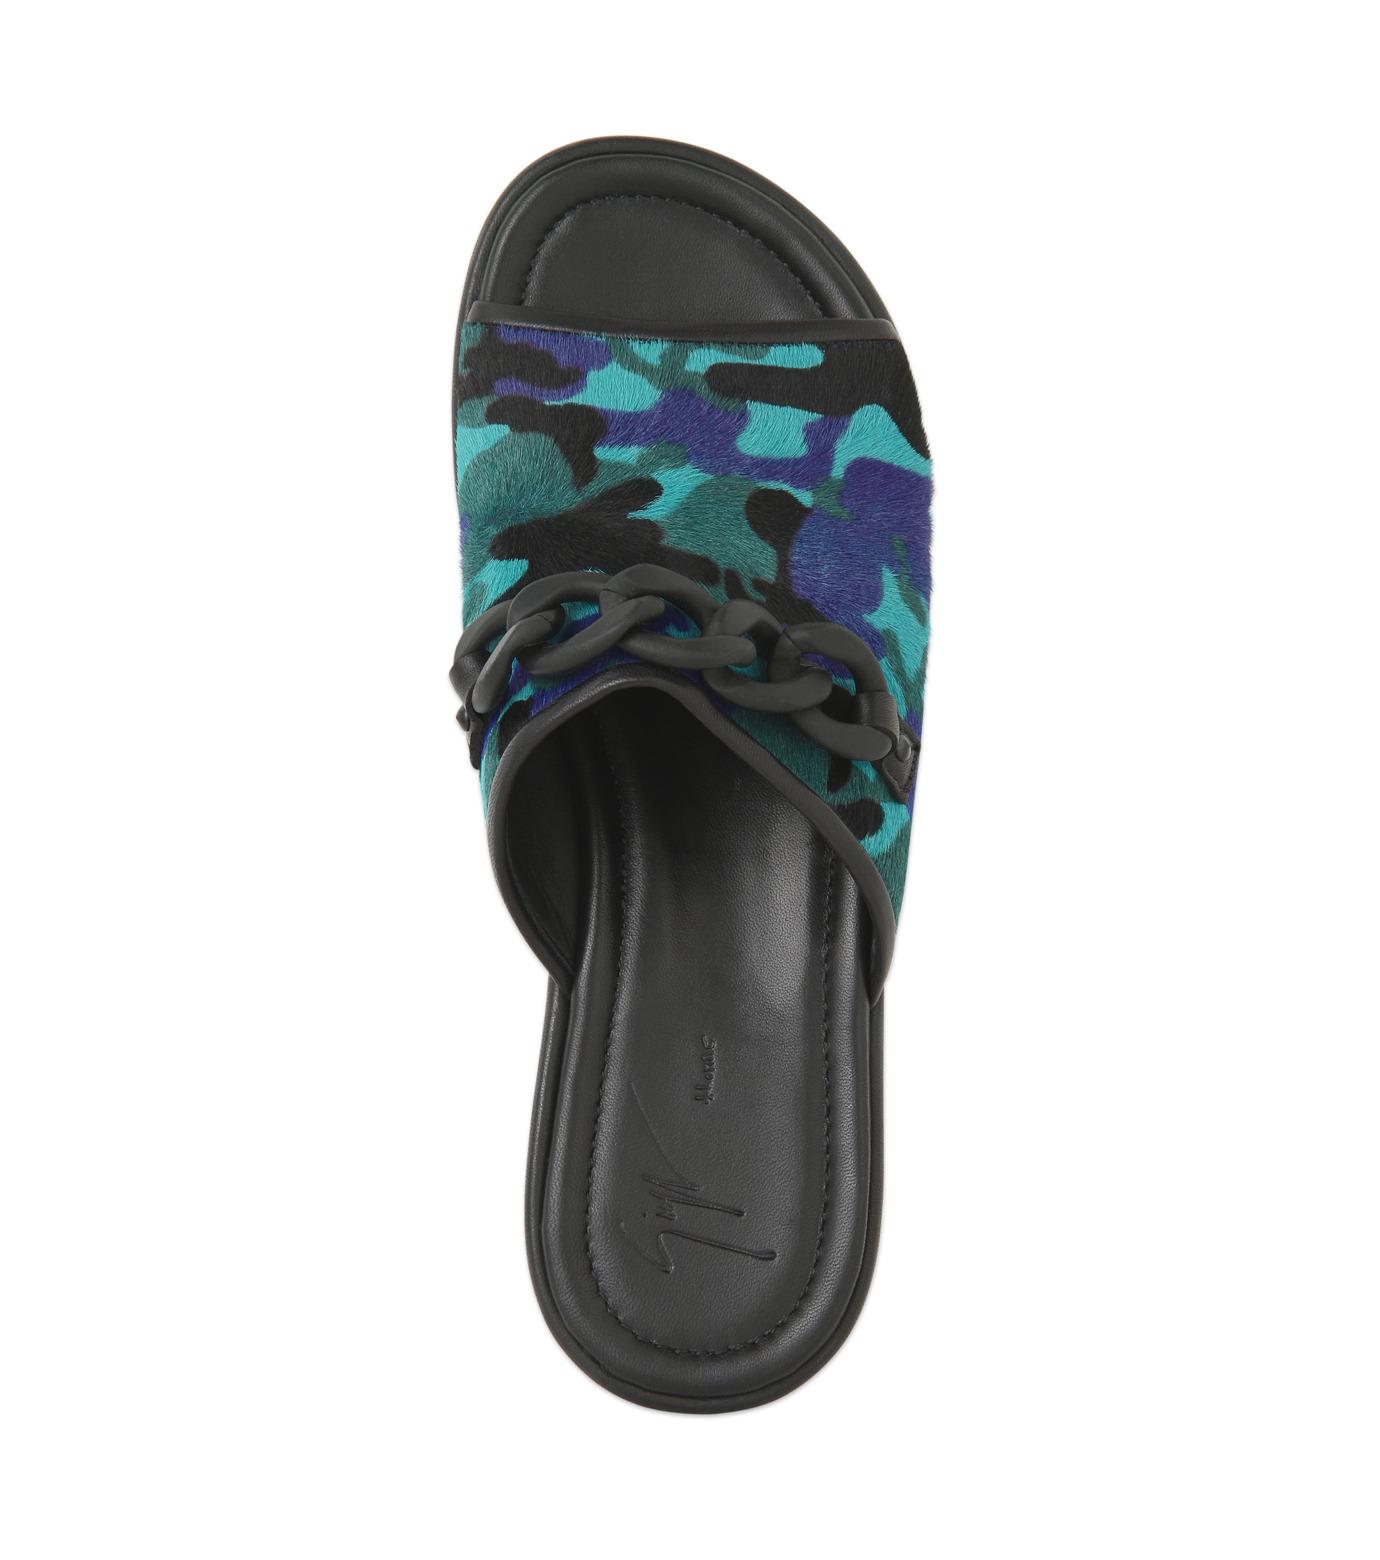 Giuseppe Zanotti Design(ジュゼッペザノッティ)のBaby Fur Camouflage Slippers-BLUE(シューズ/shoes)-RM5067LO-T-92 拡大詳細画像4